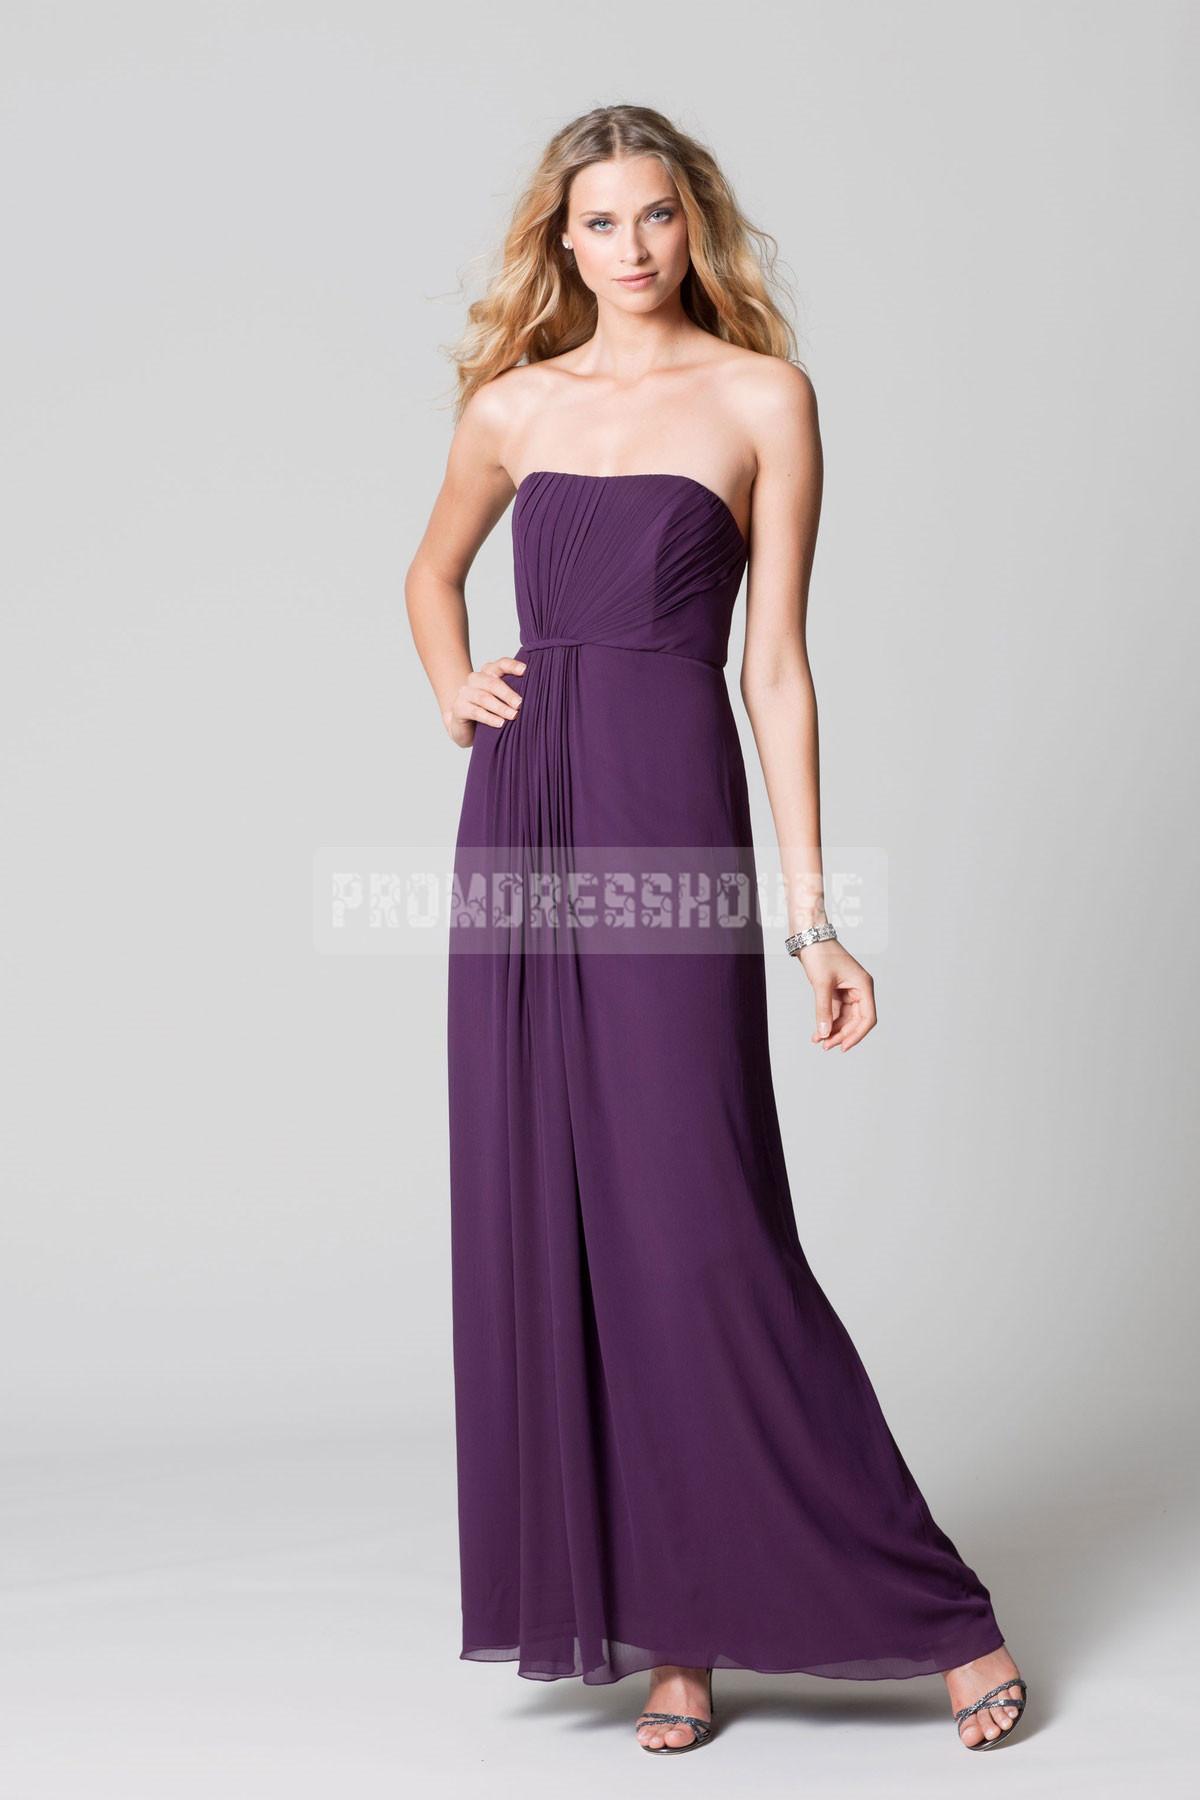 Timeless Grape Floor Length Chiffon Pleated A-line Bridesmaid Dress - Promdresshouse.com